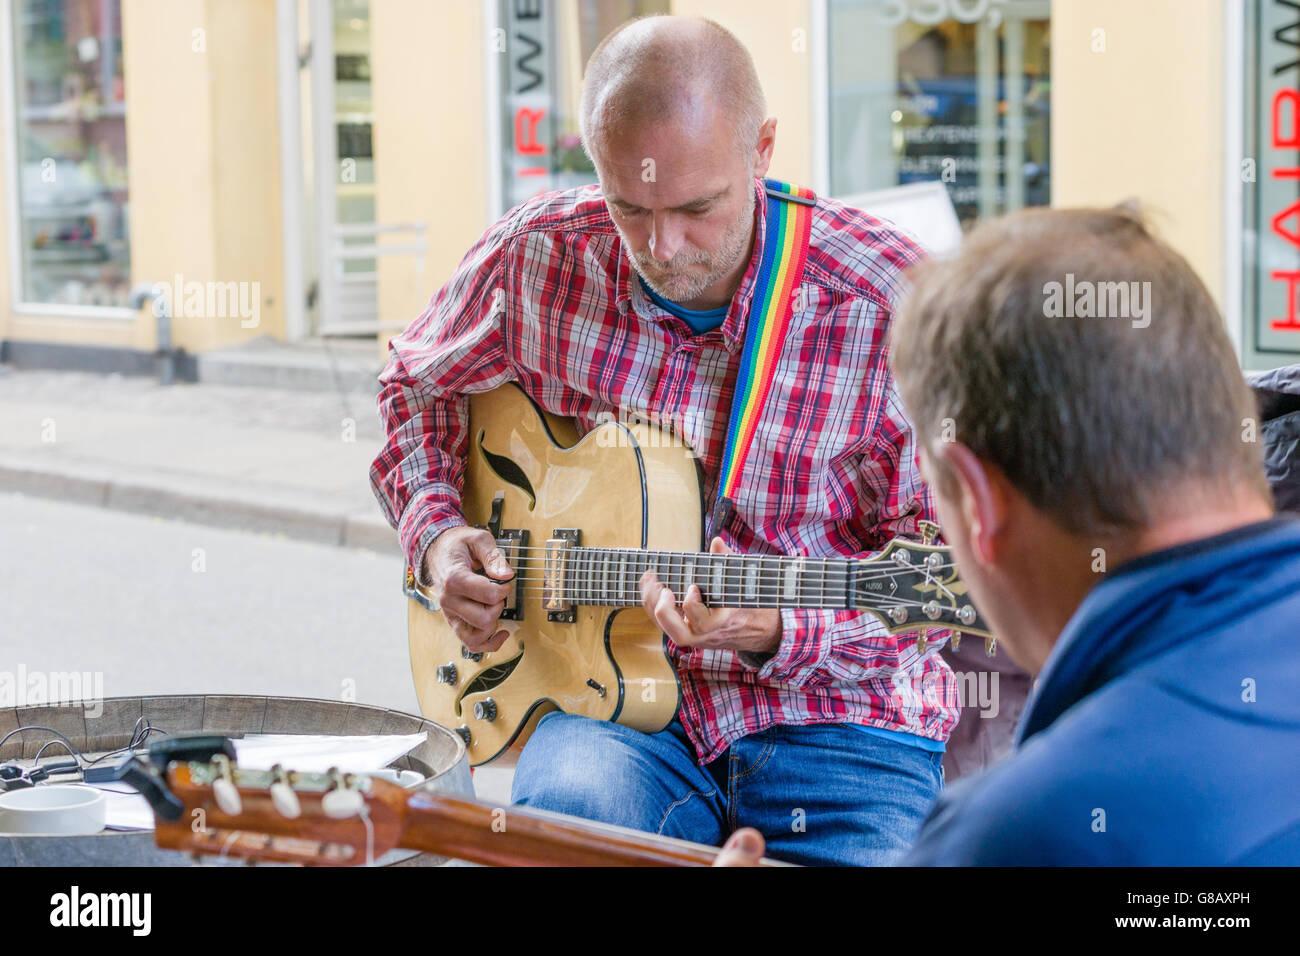 Jazz guitar street music between people and bicycles in Copenhagen, two men playing - Stock Image